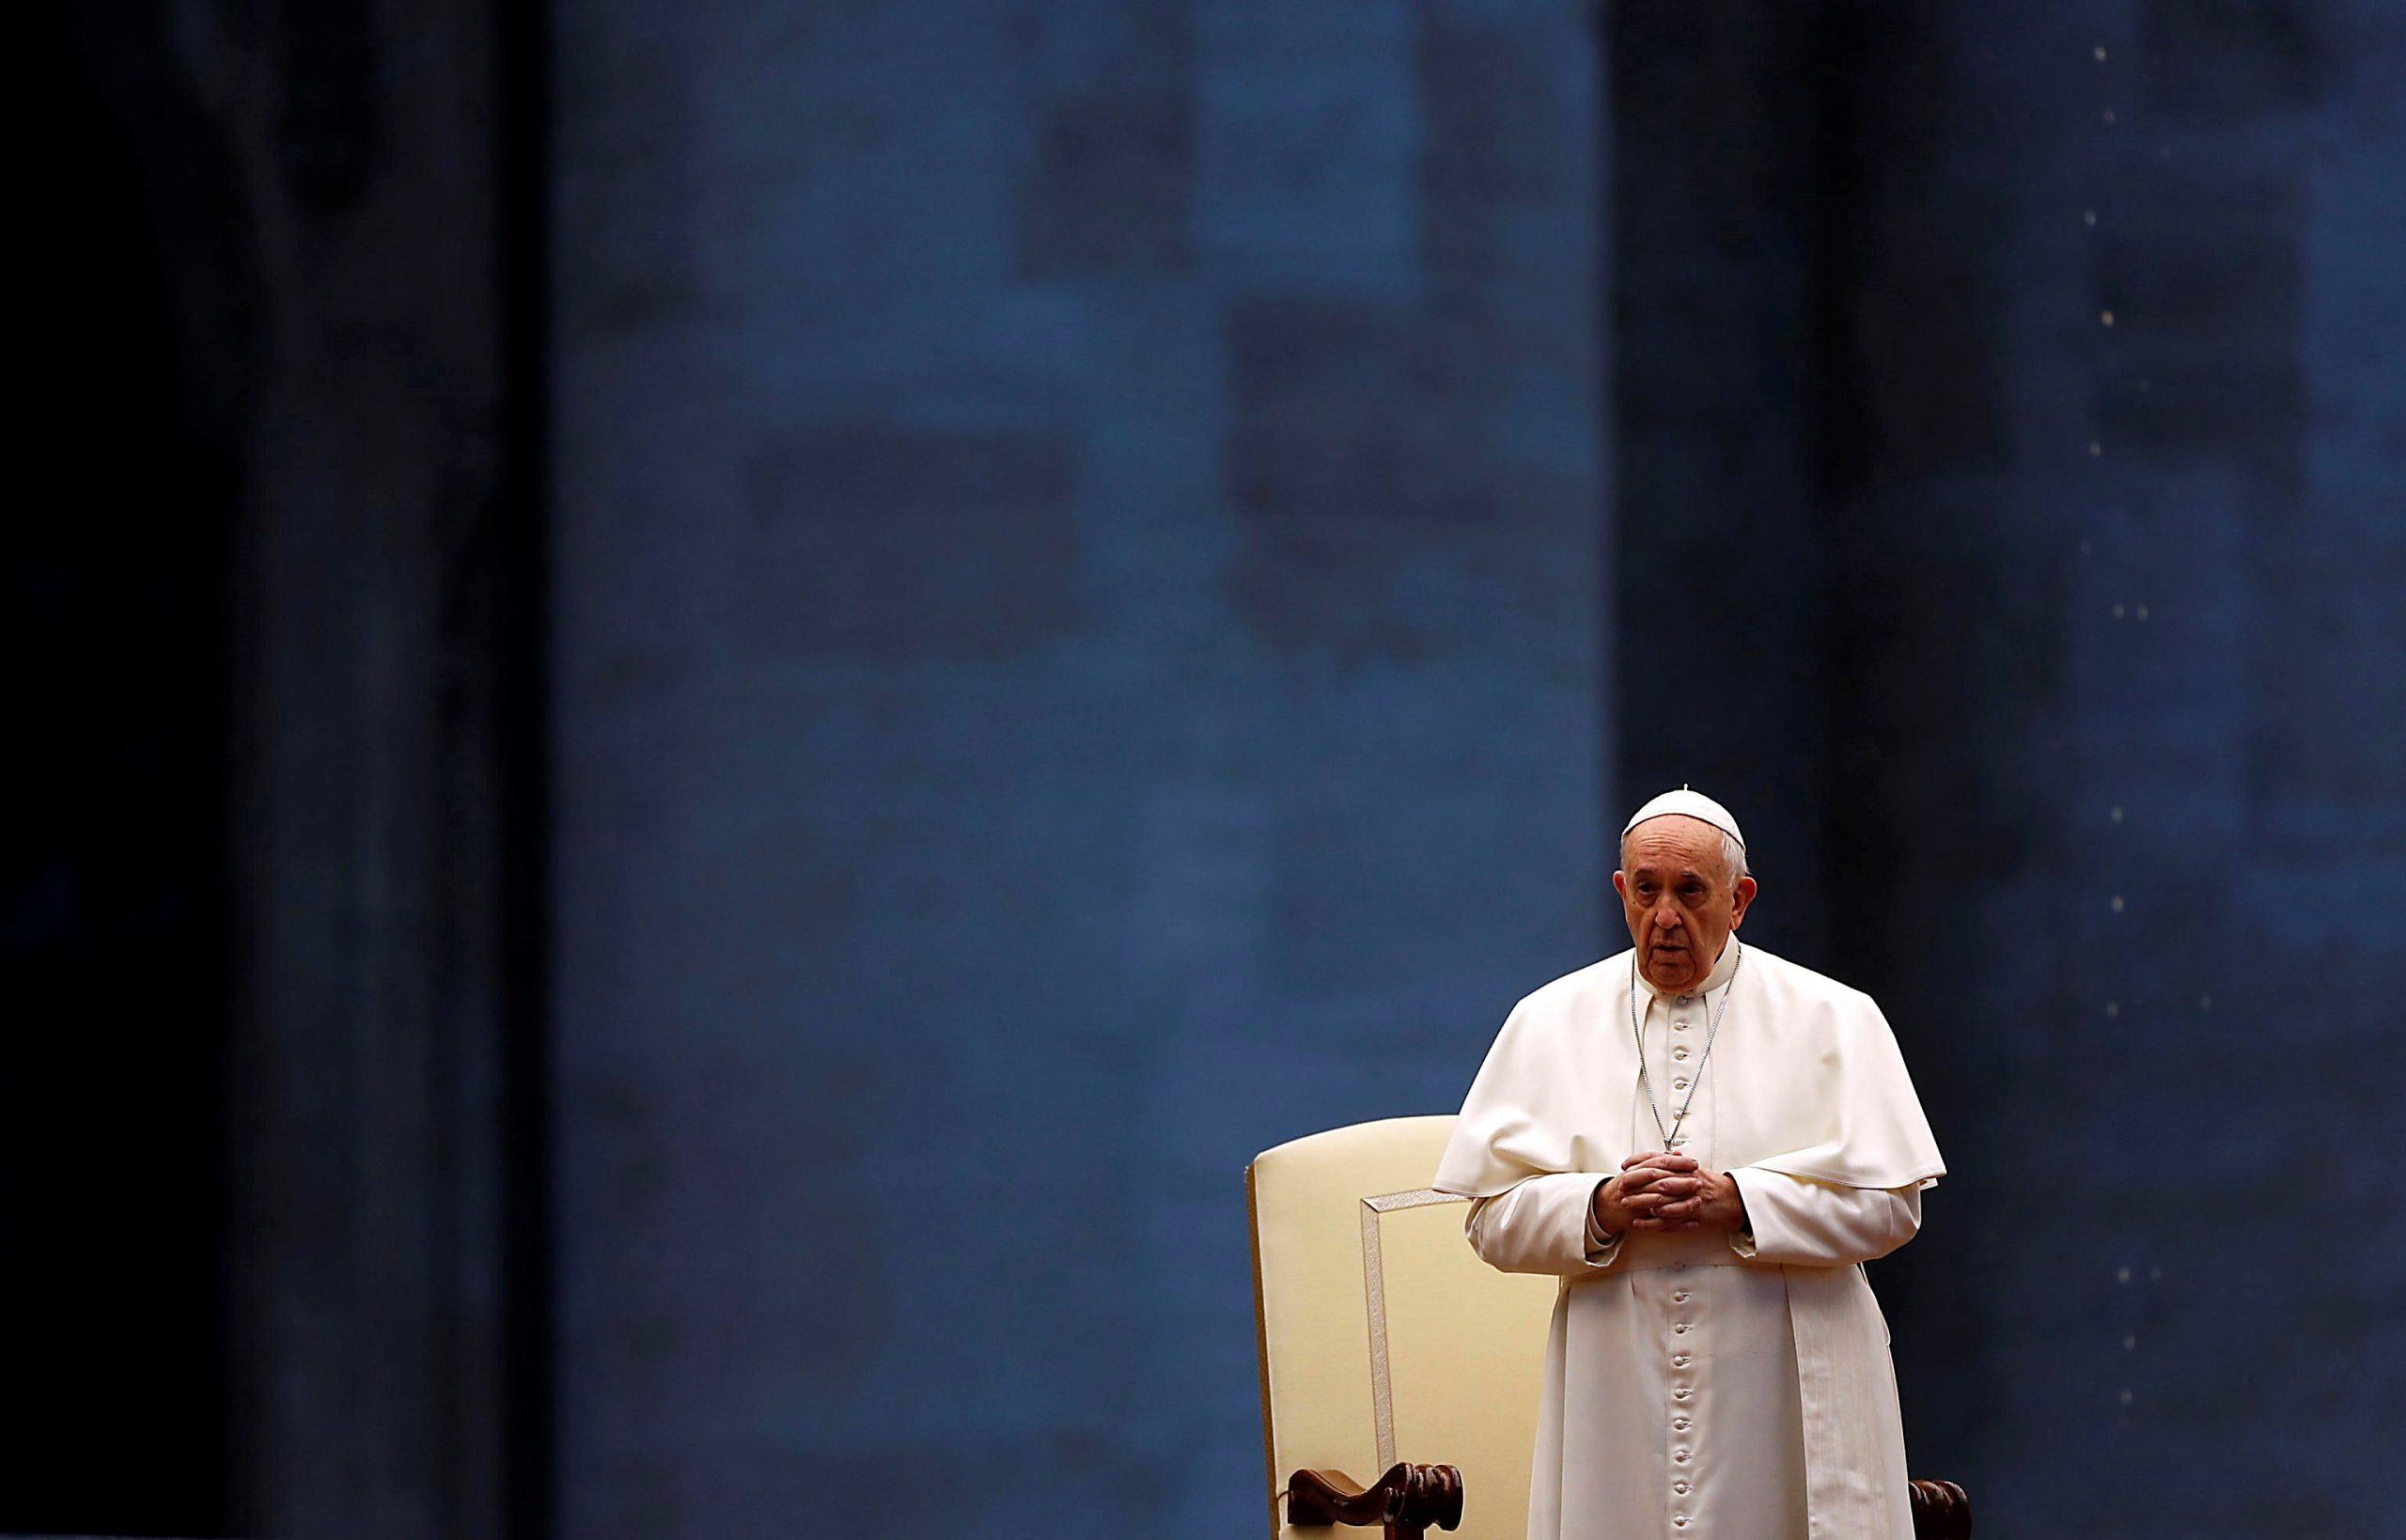 El papa Francisco. Foto de EFE/EPA/YARA NARDI / POOL